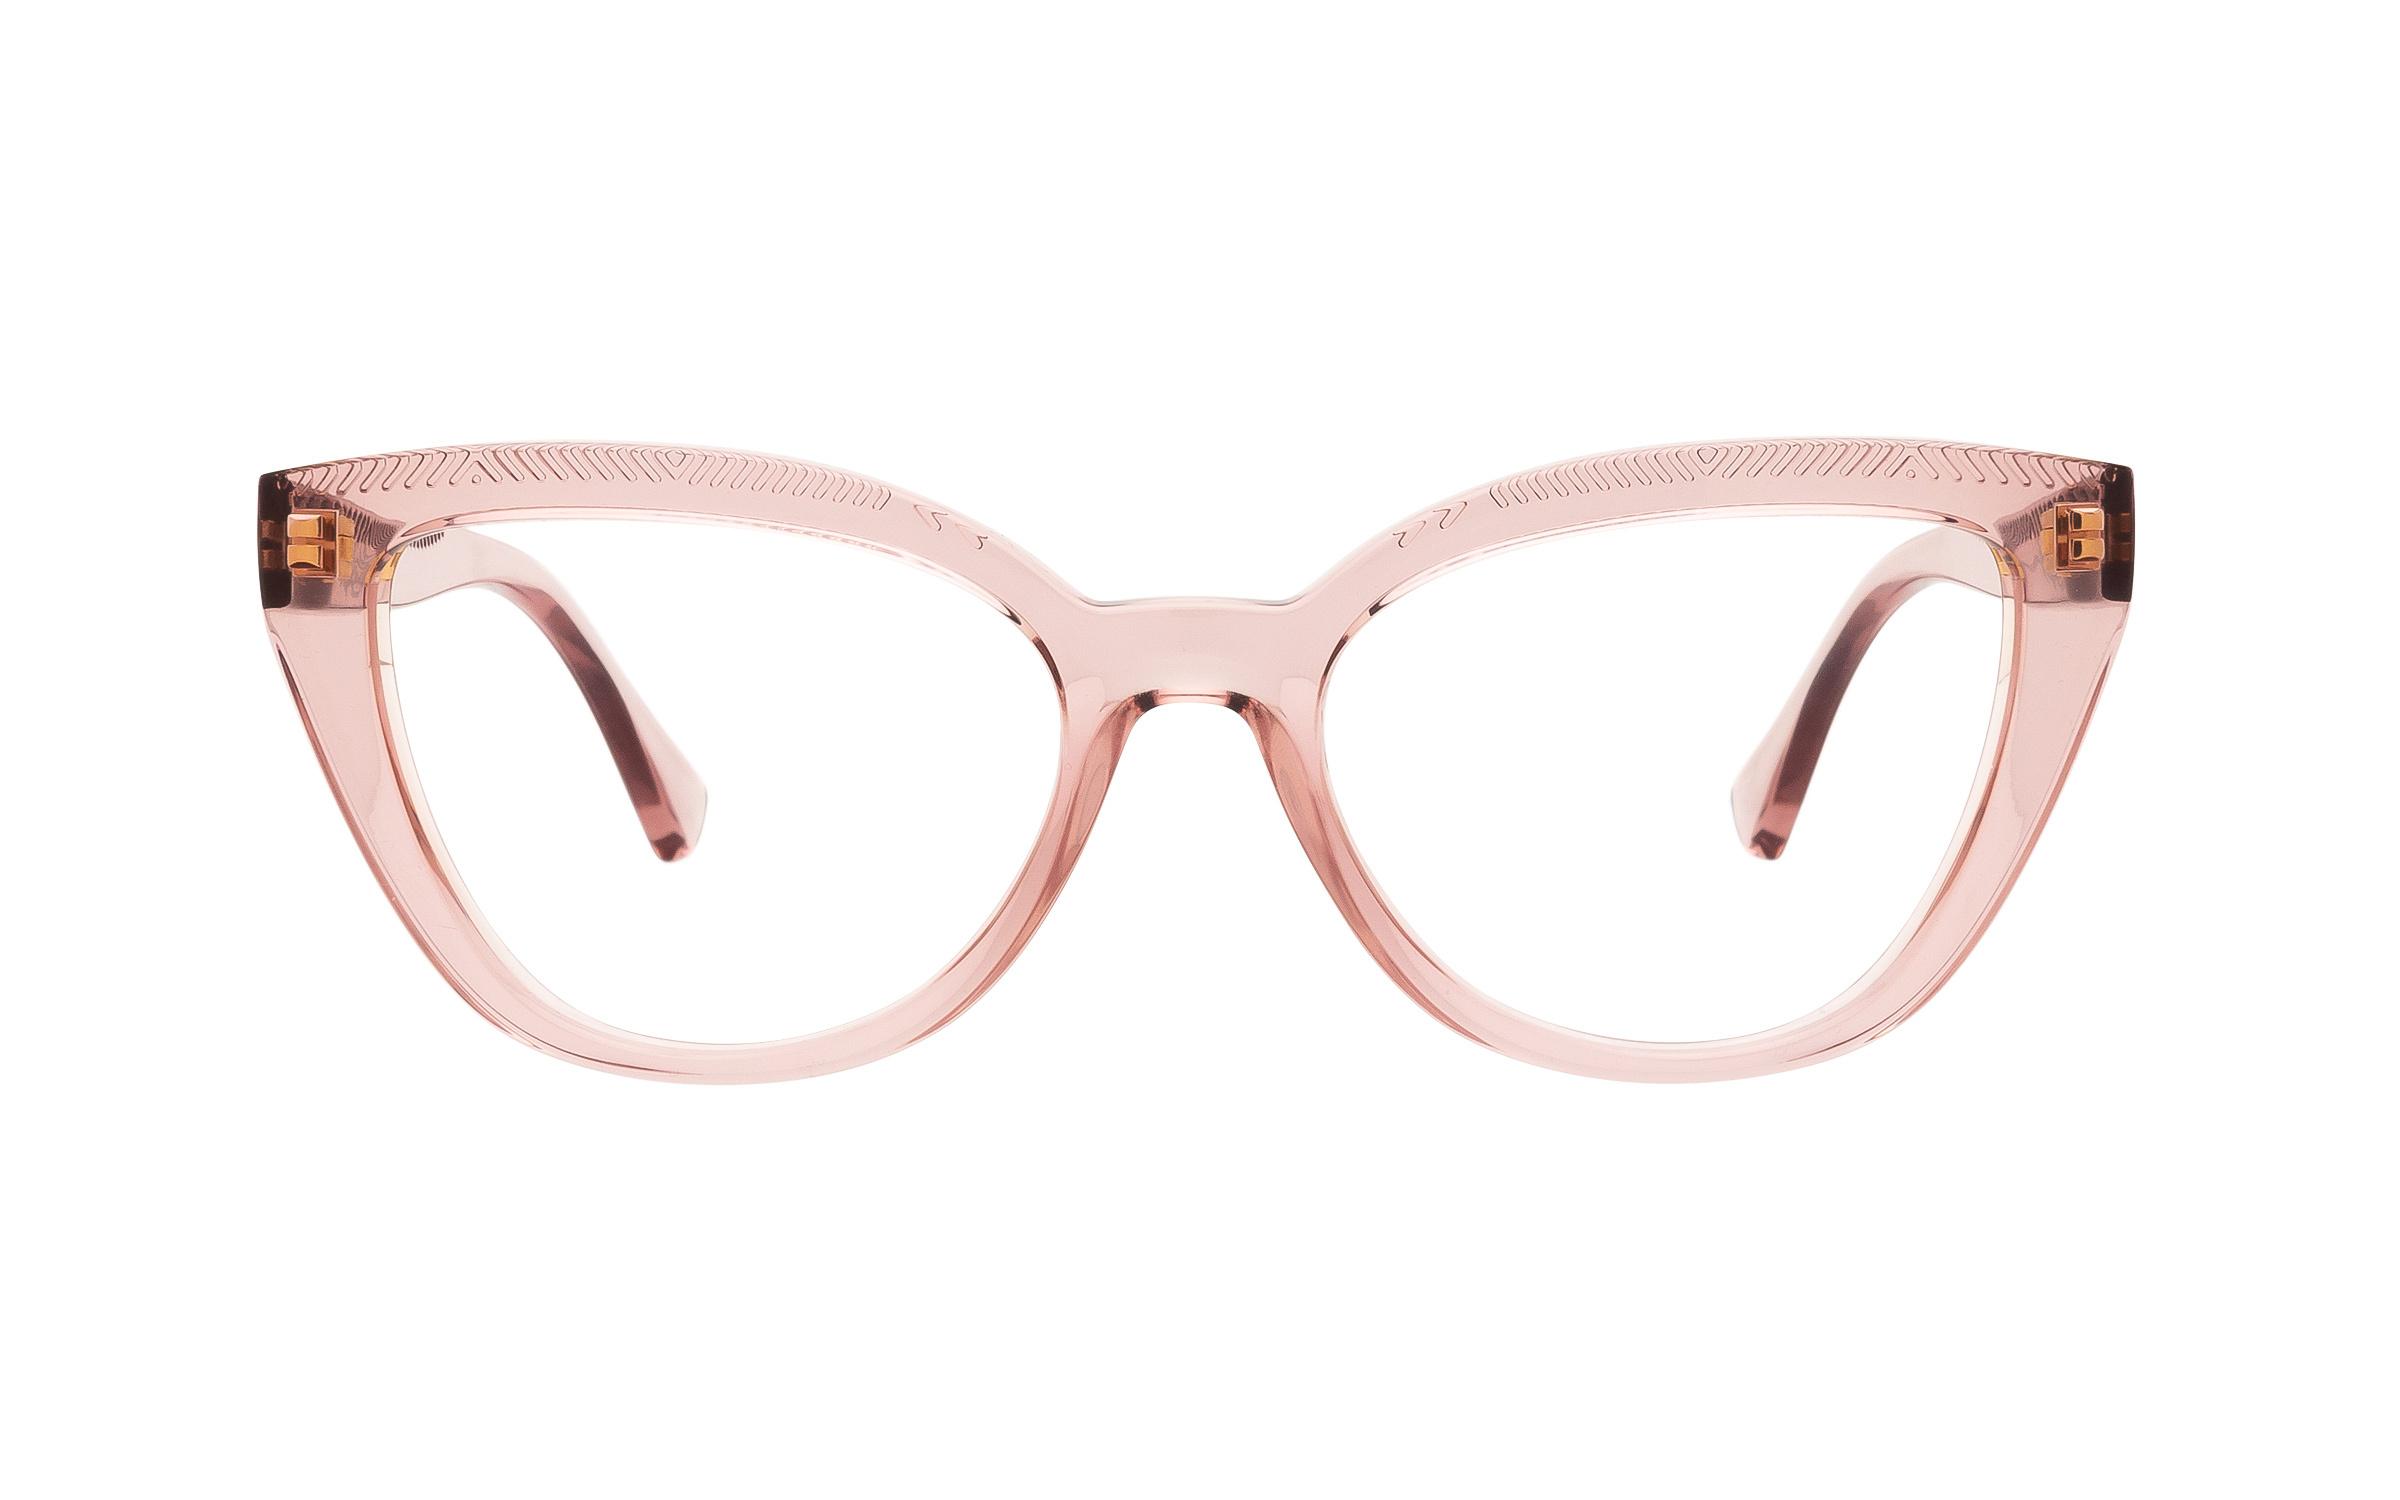 Ralph by Ralph Lauren RA7112 5801 (53) Eyeglasses and Frame in Transparent Pink - Online Coastal